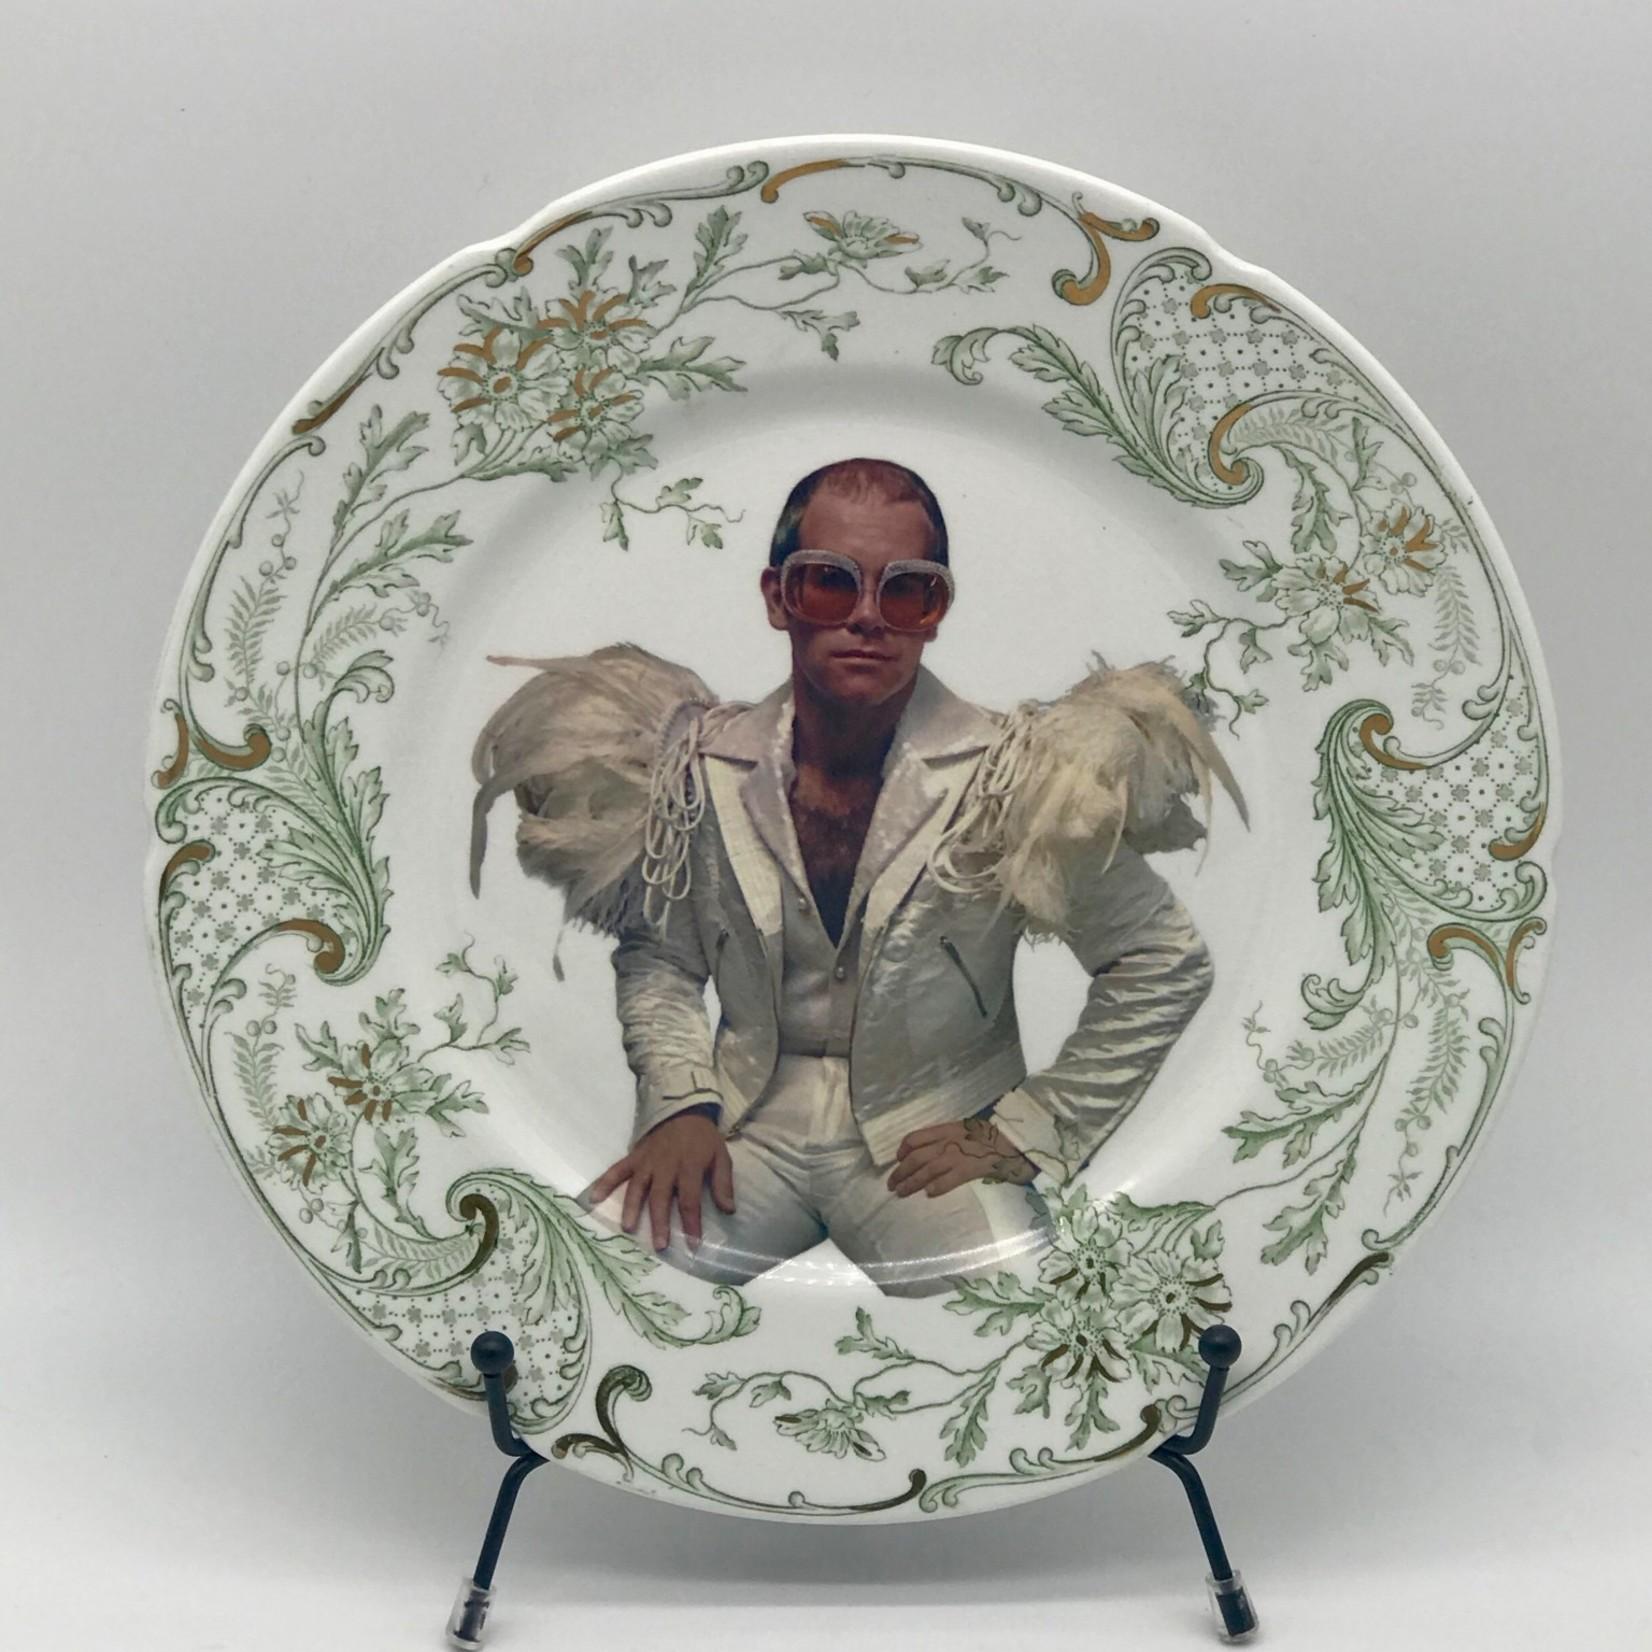 Camp Mercantile Camp Mercantile Elton John Plate